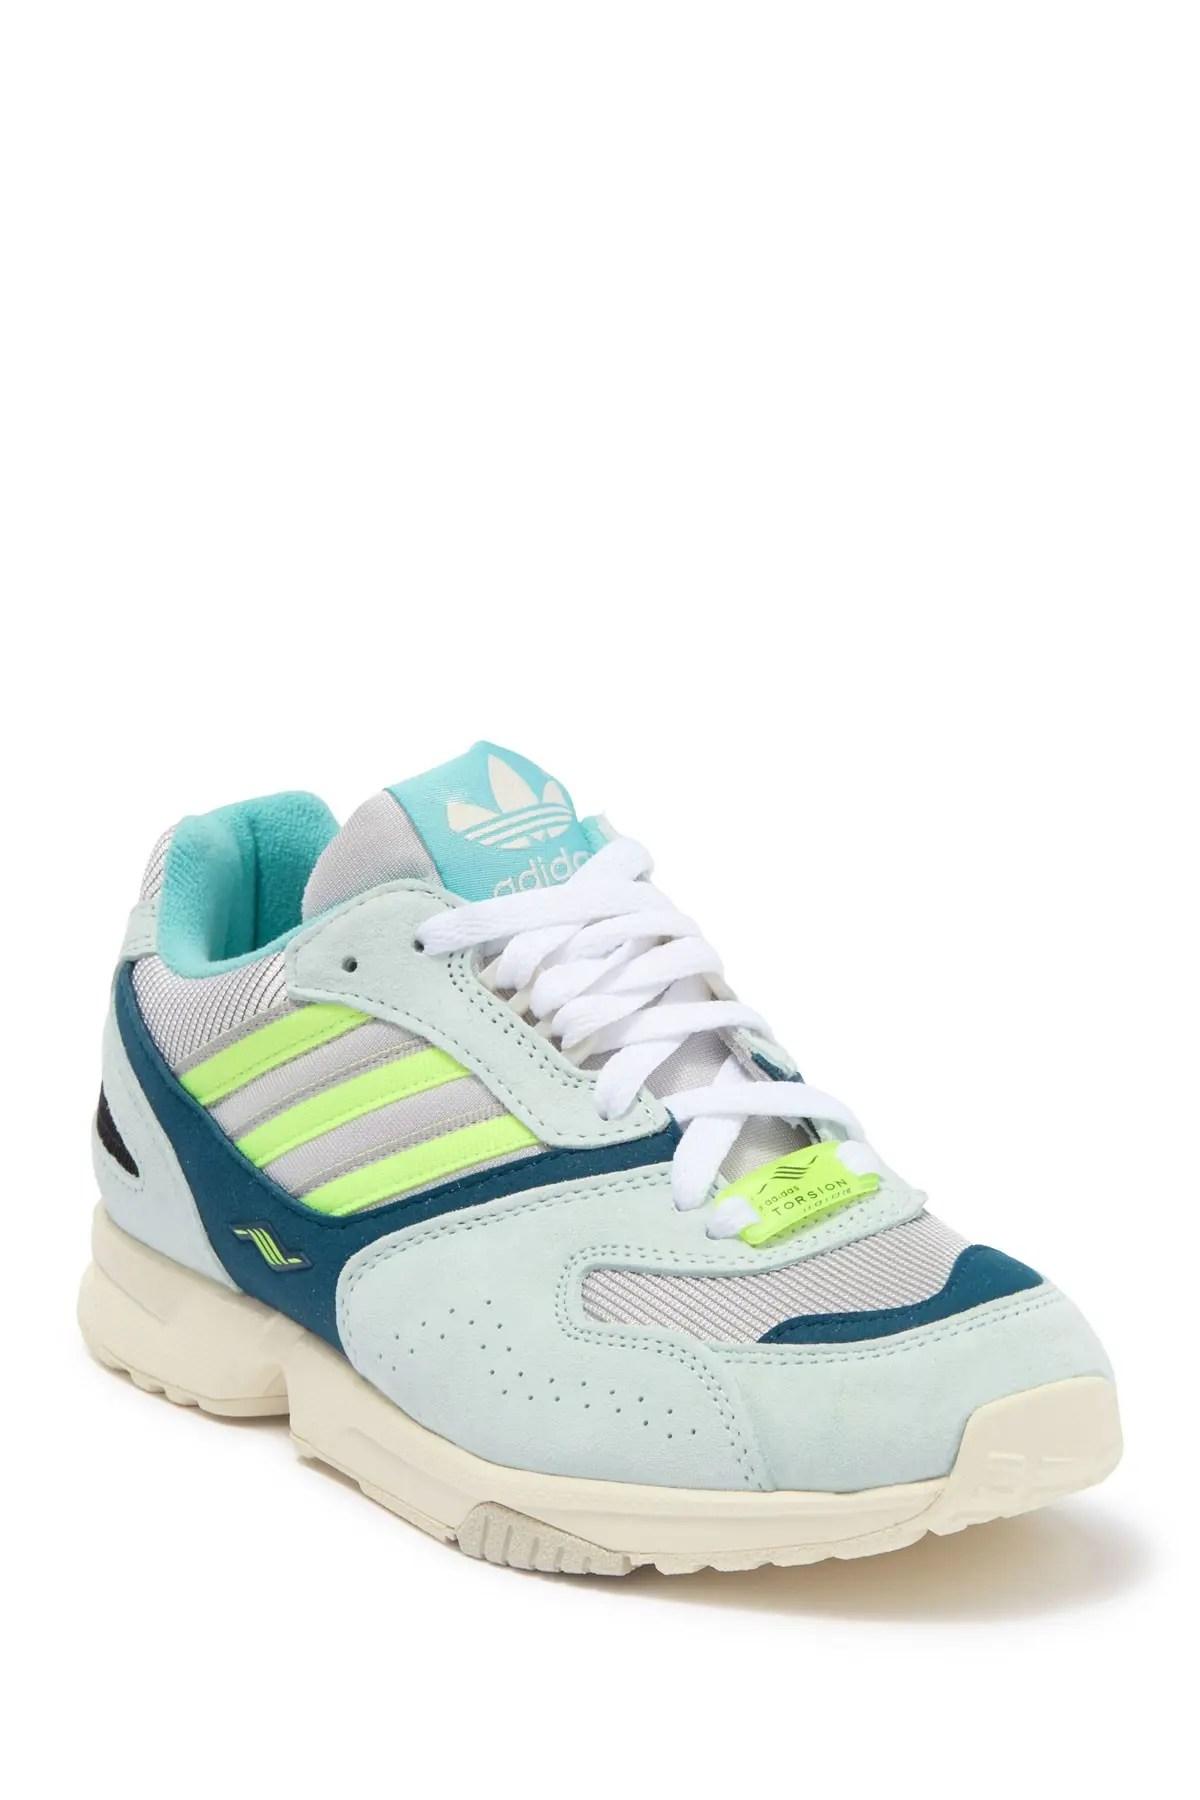 adidas sneakers for women nordstrom rack